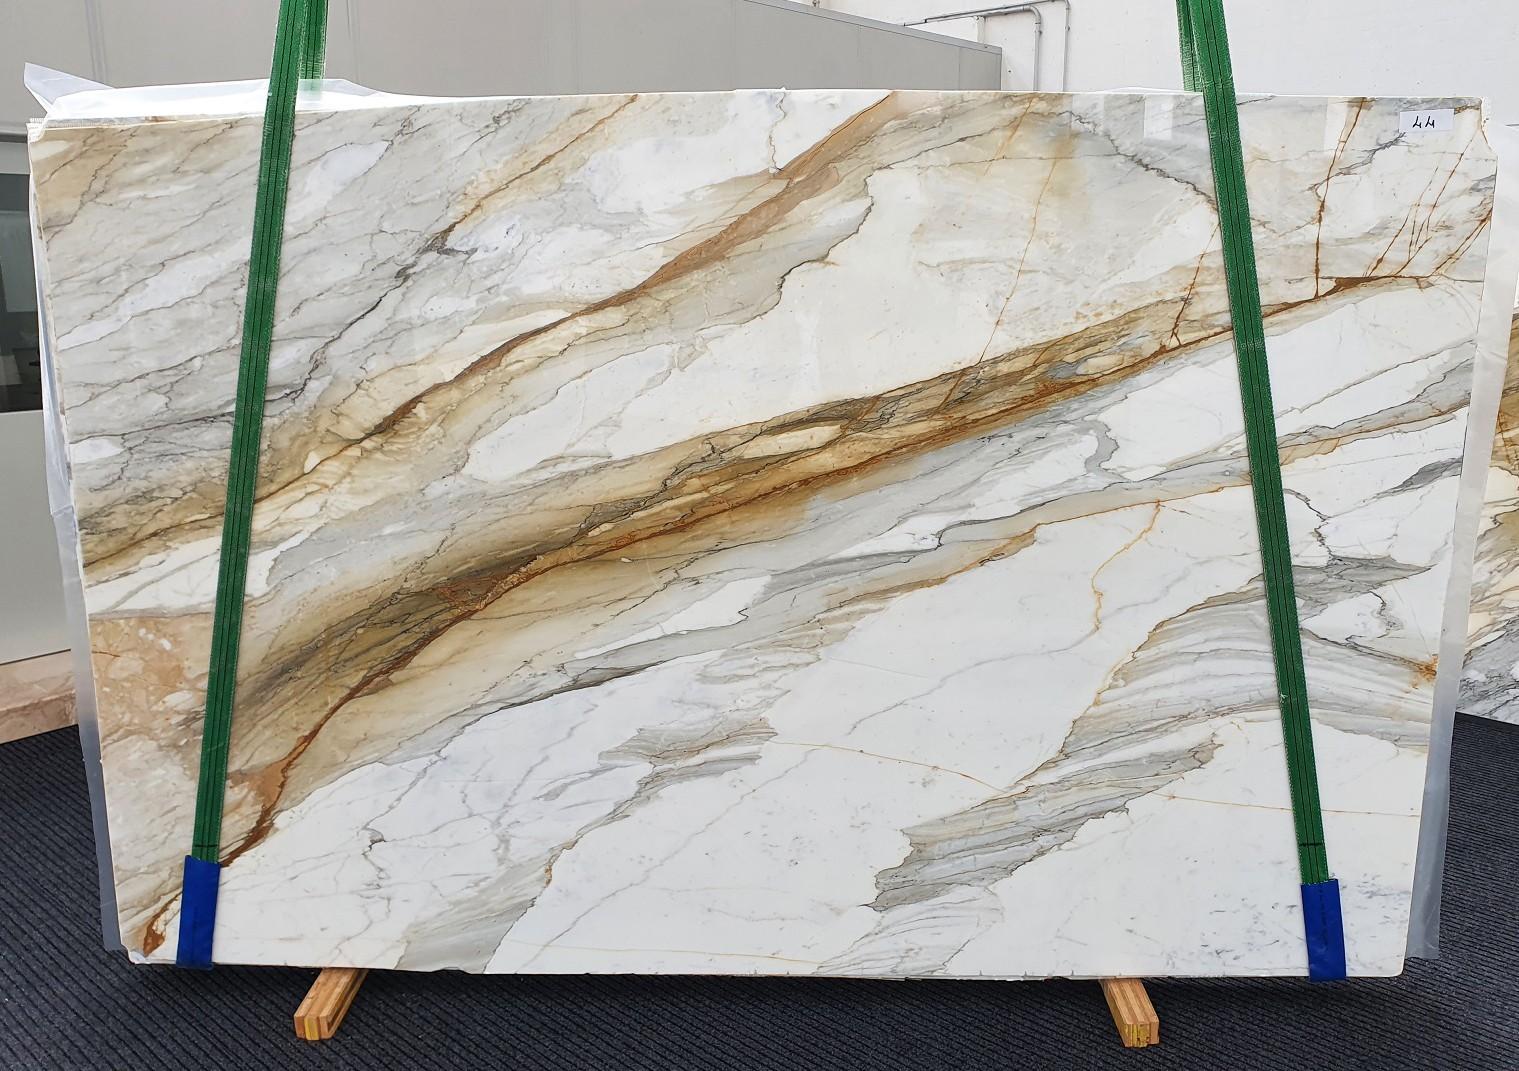 CALACATTA MACCHIAVECCHIA polierte Unmaßplatten 1354 aus Natur Marmor , Slab #44: Lieferung Veneto, Italien